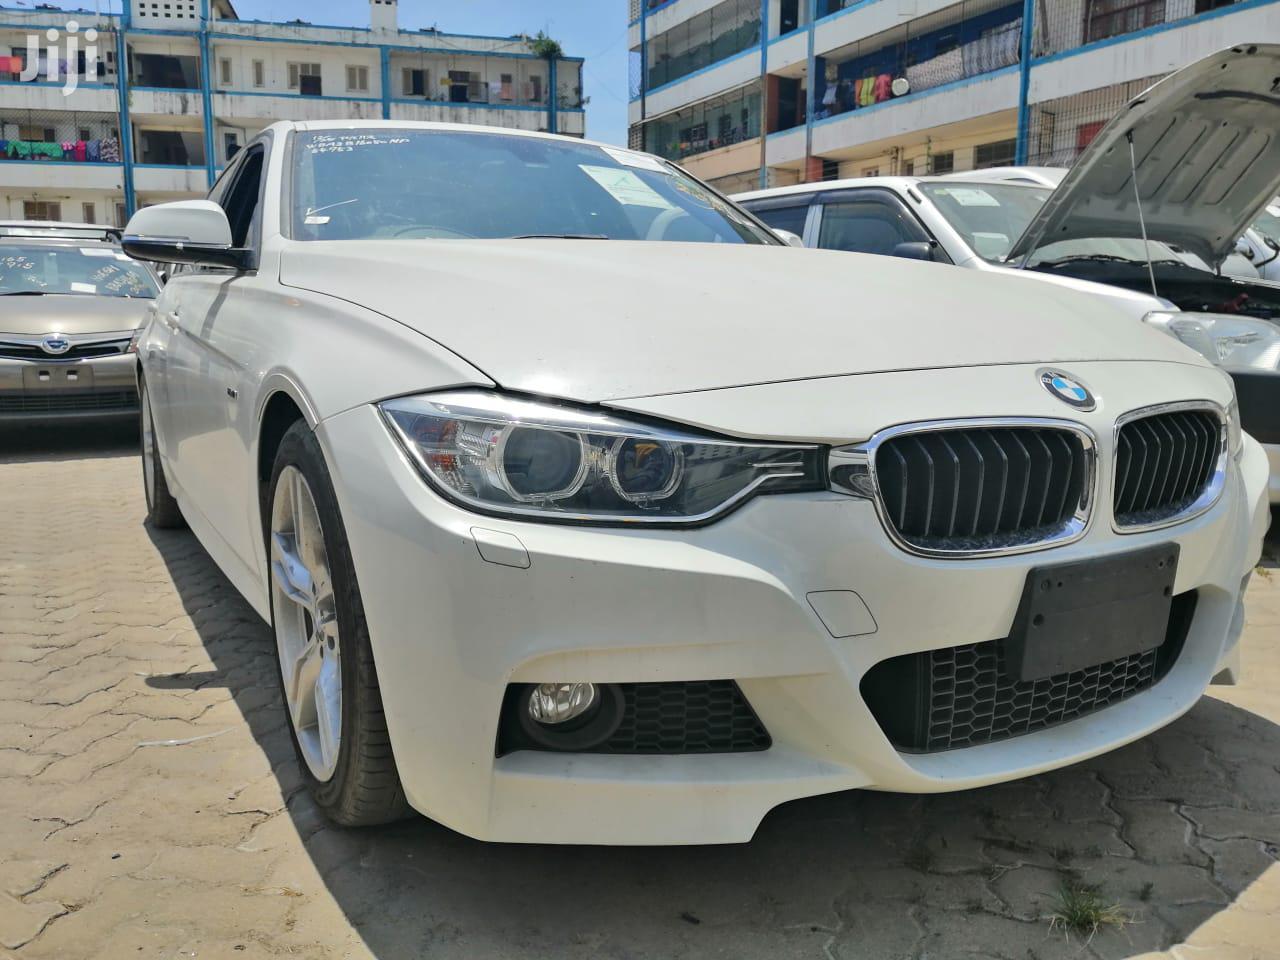 Archive: New BMW 320i 2013 White